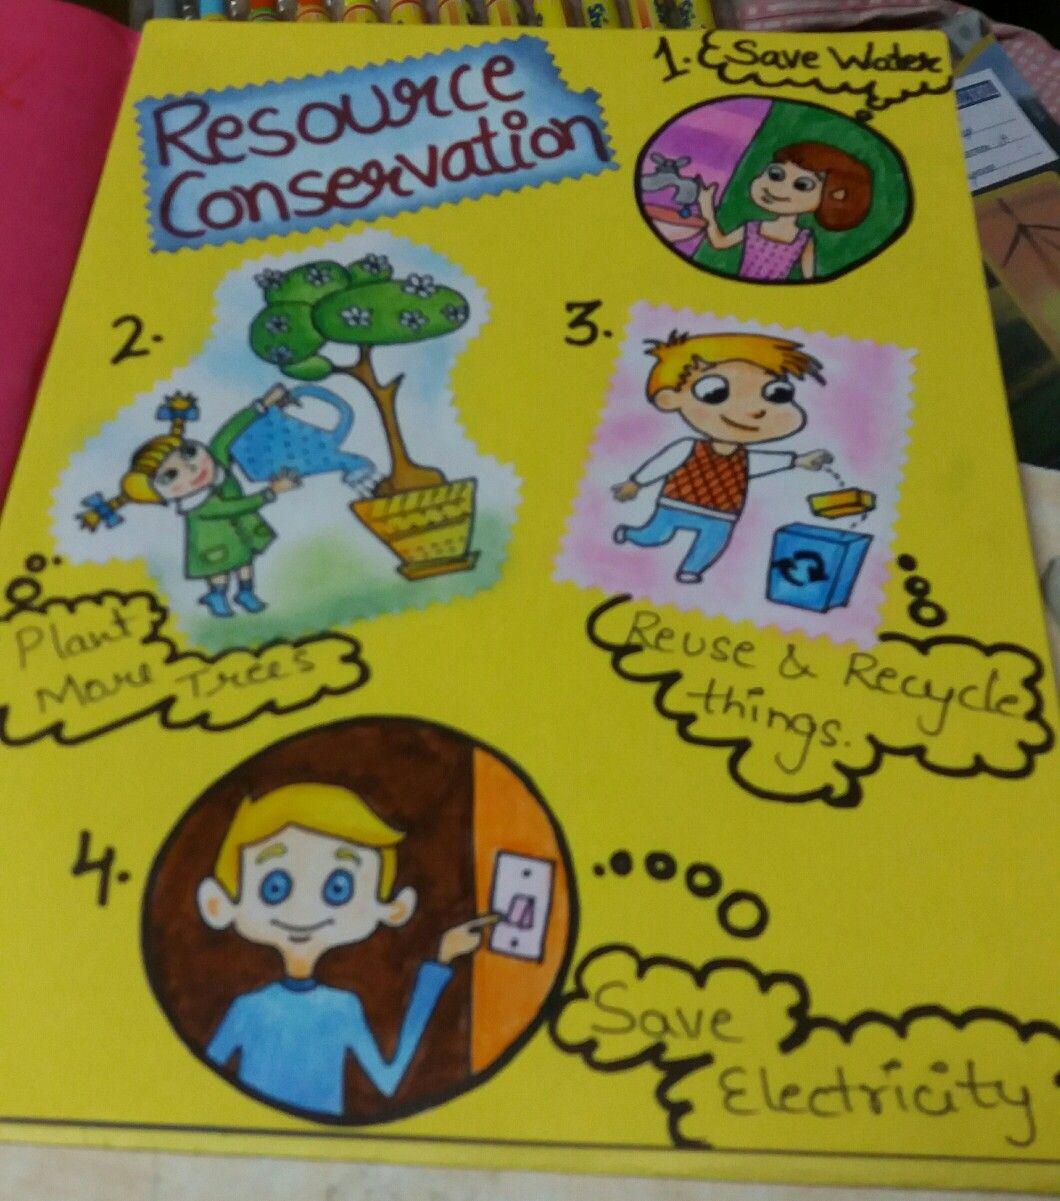 Resource Conservation 1